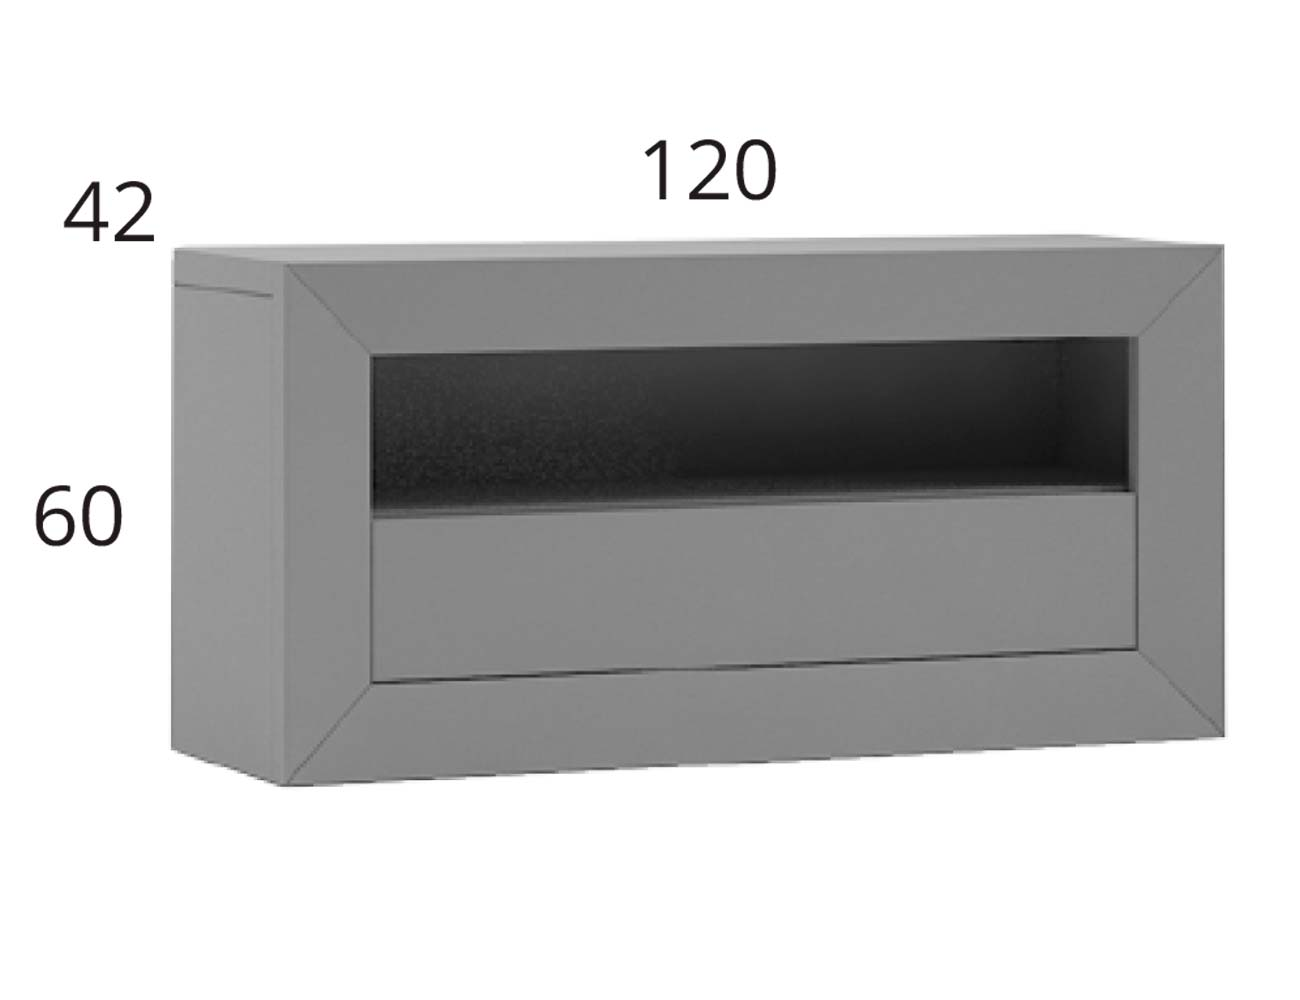 A0602